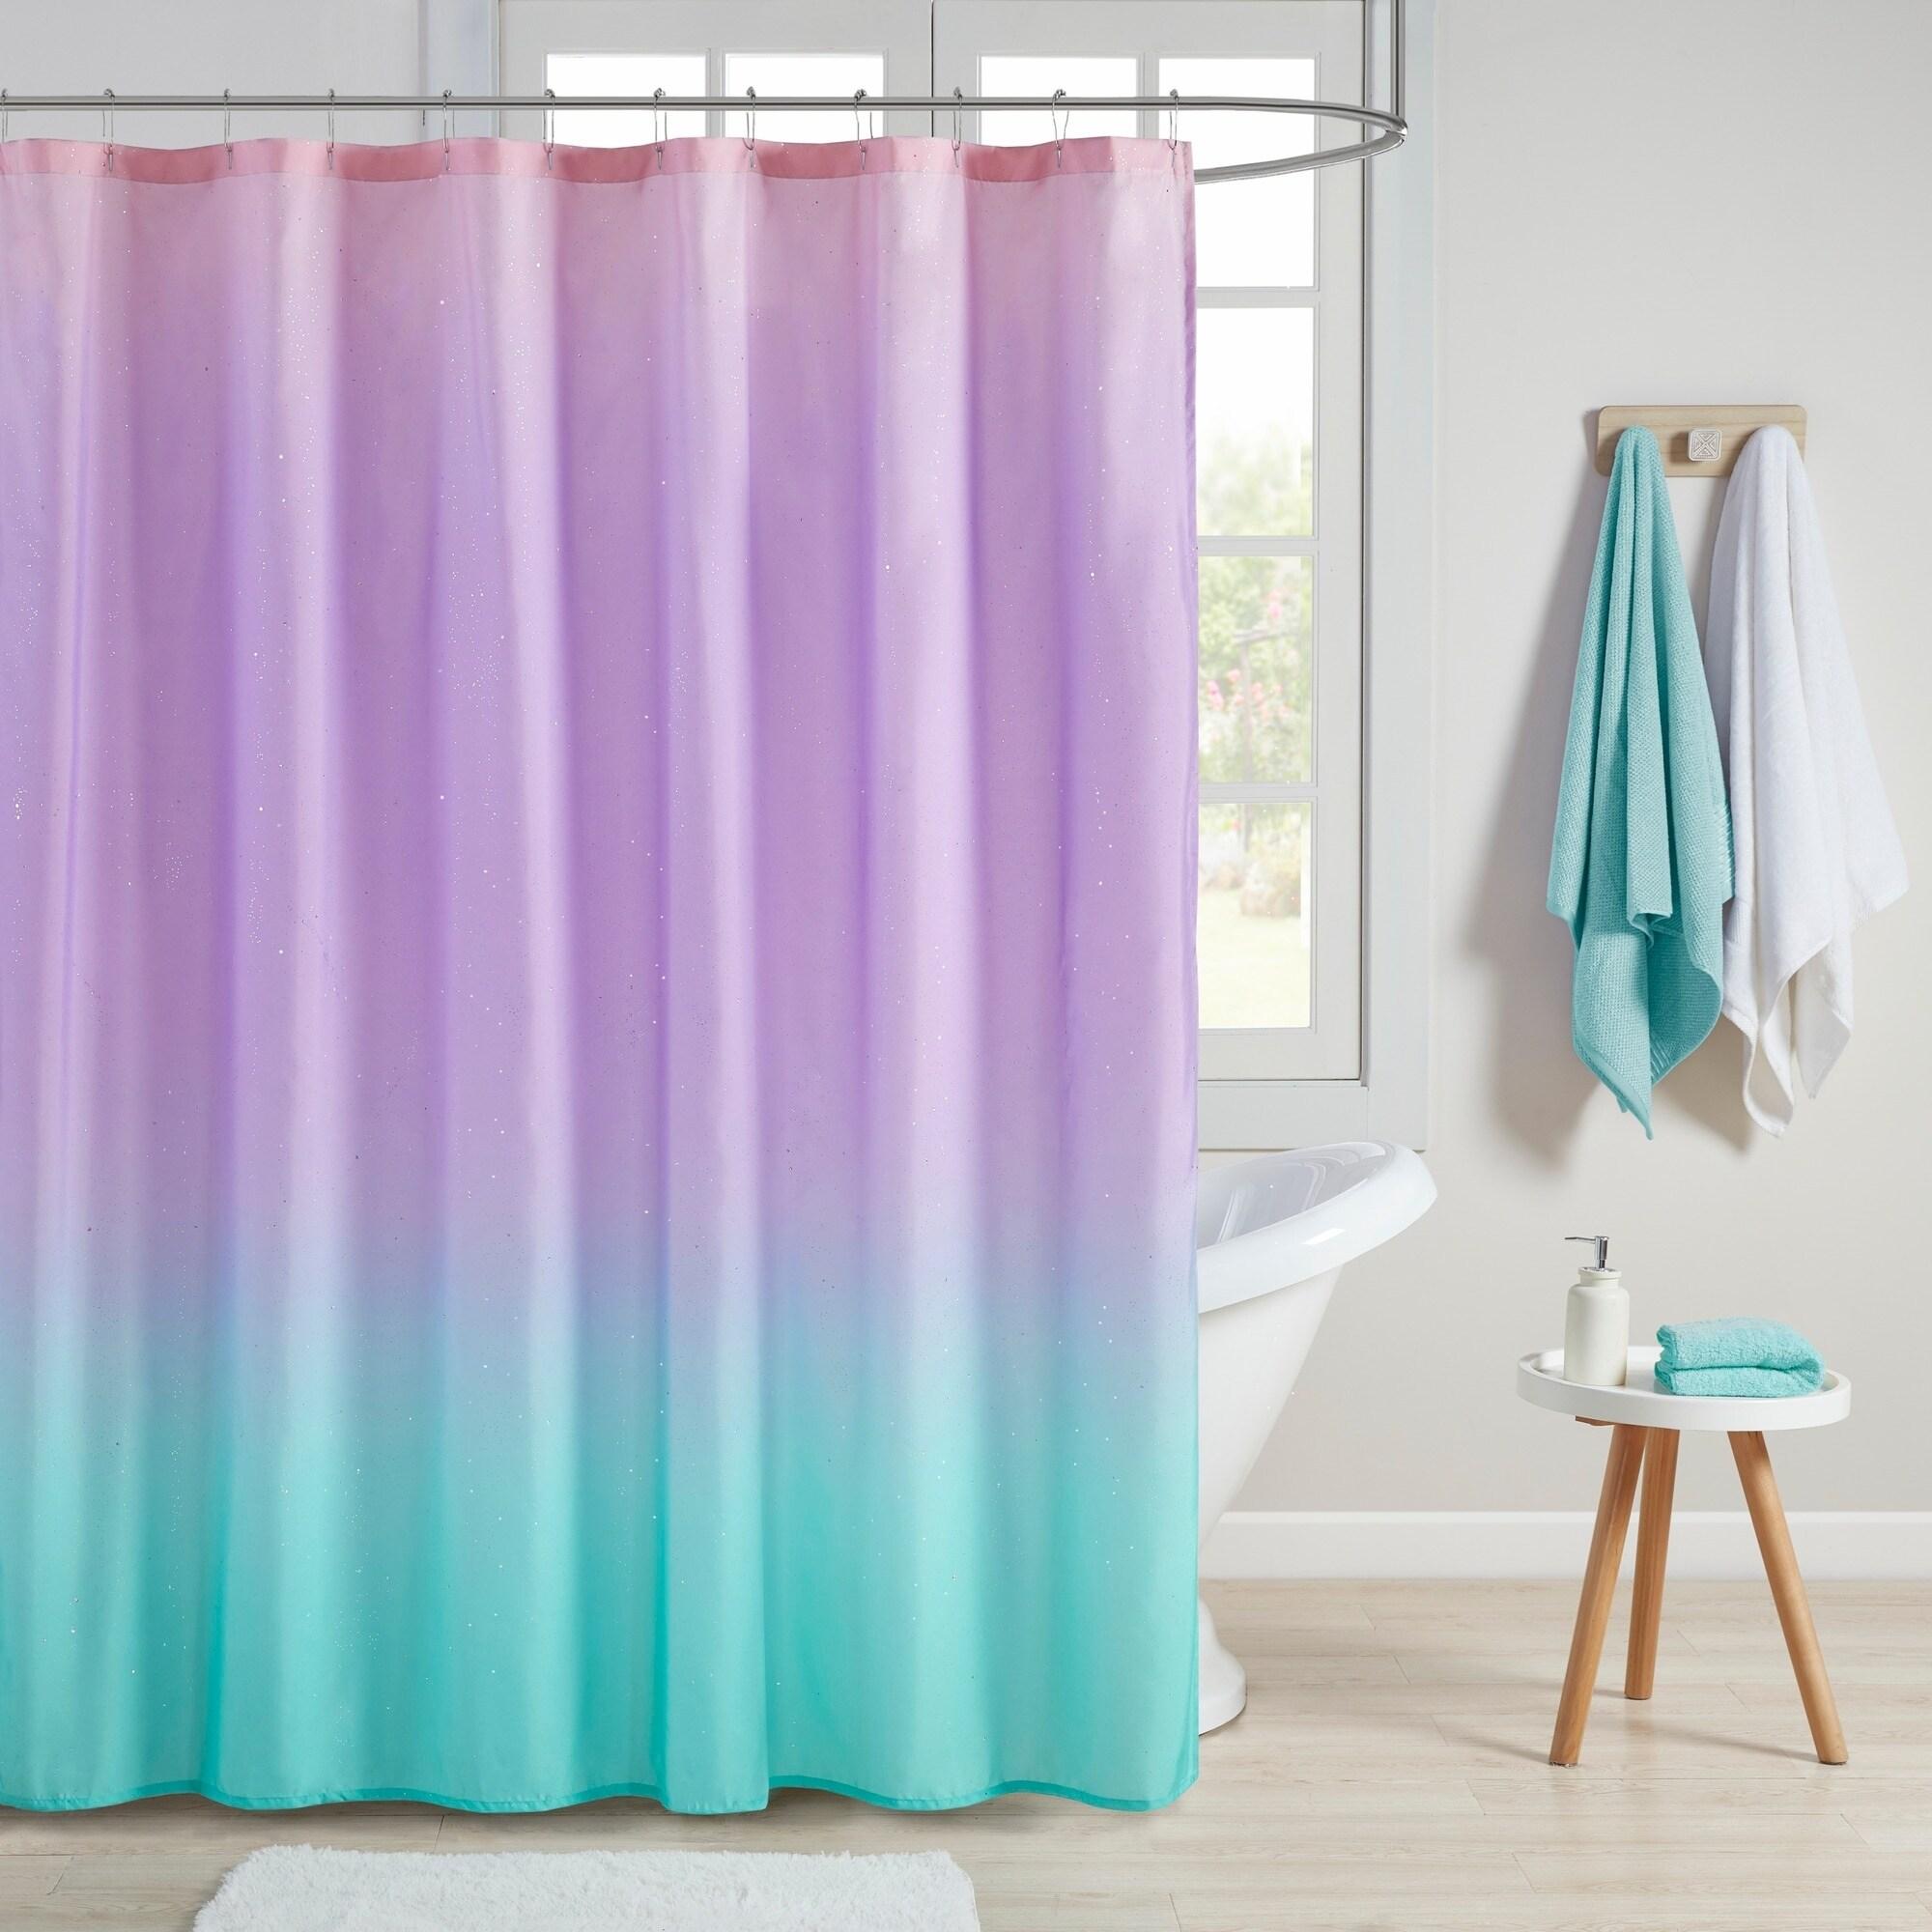 مضطرب تنوير صلة aqua and purple curtains